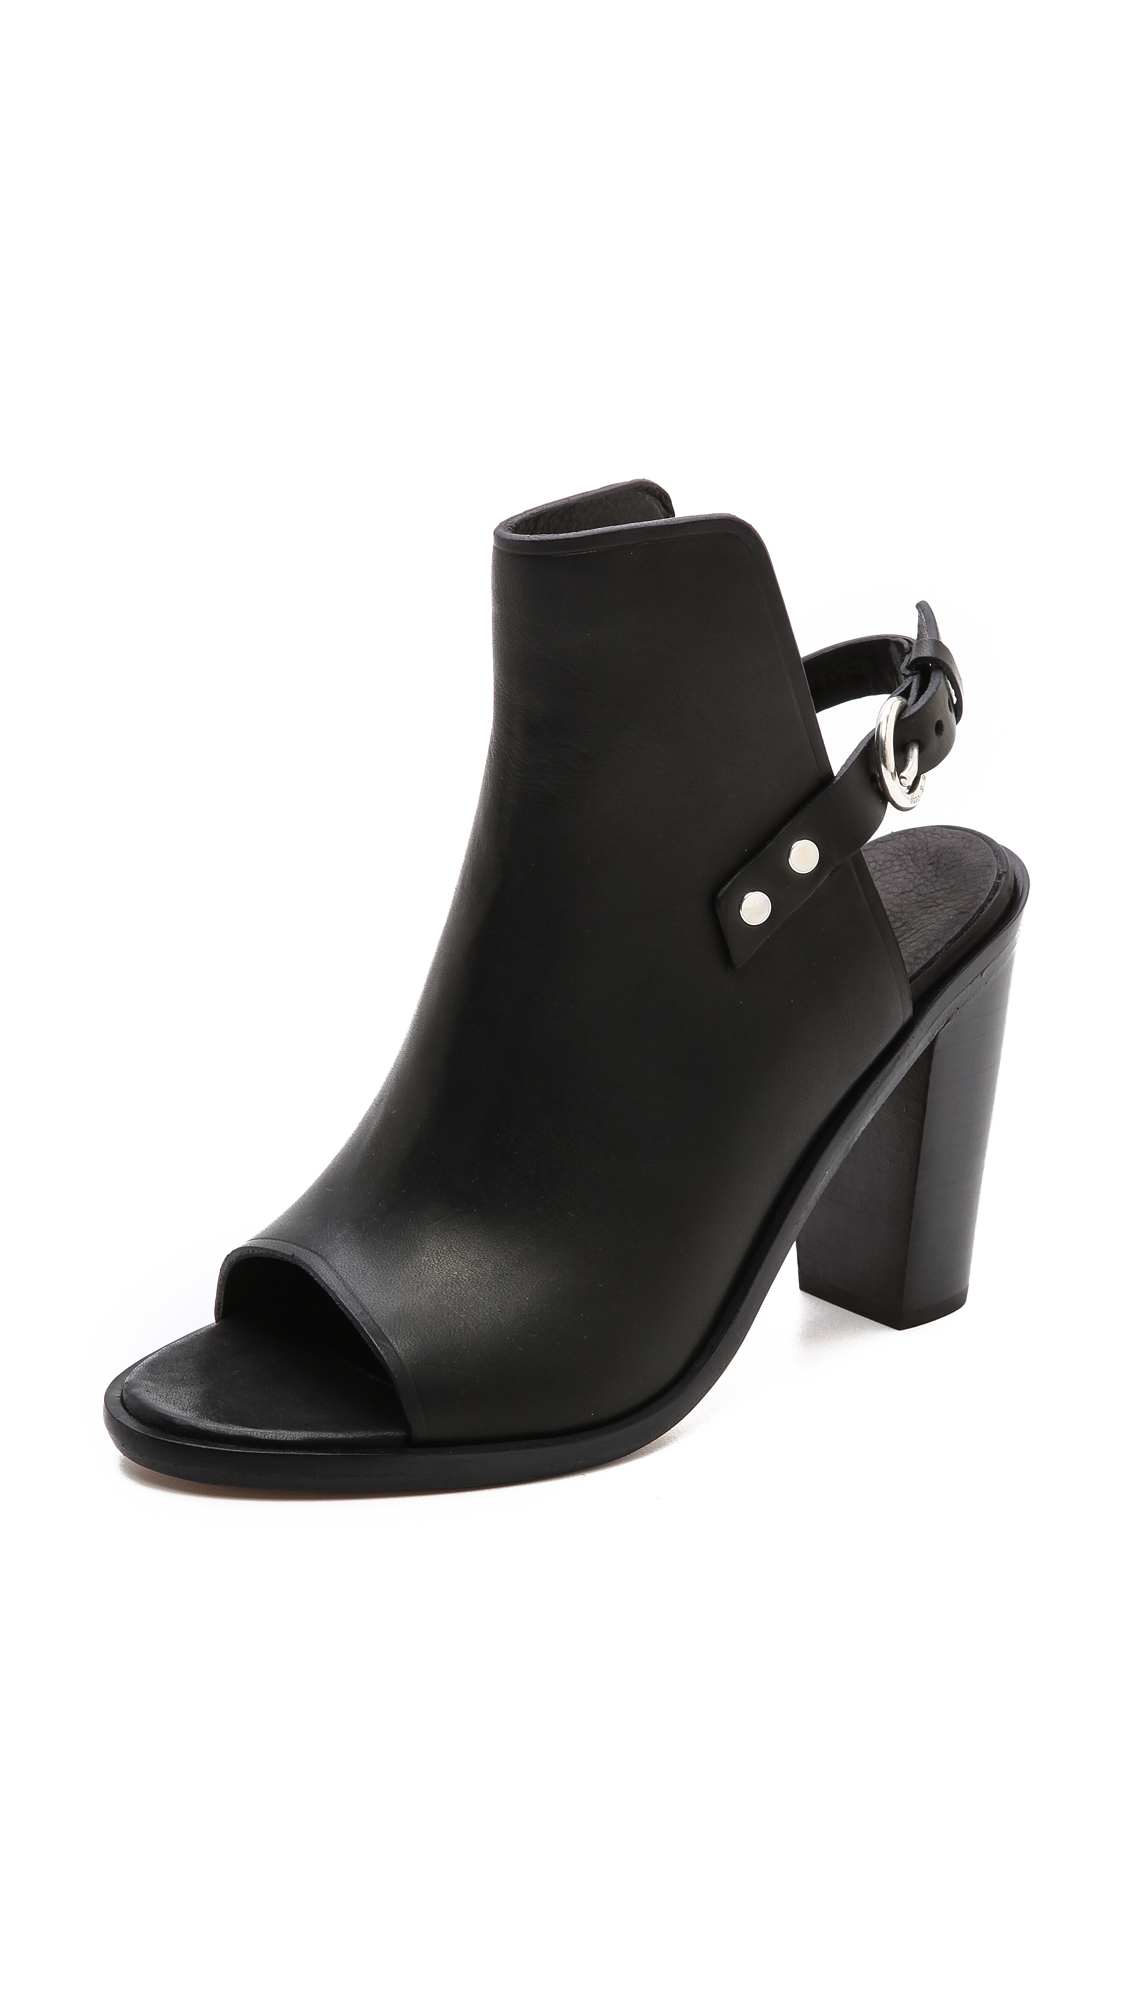 Rag & bone wyatt sandals